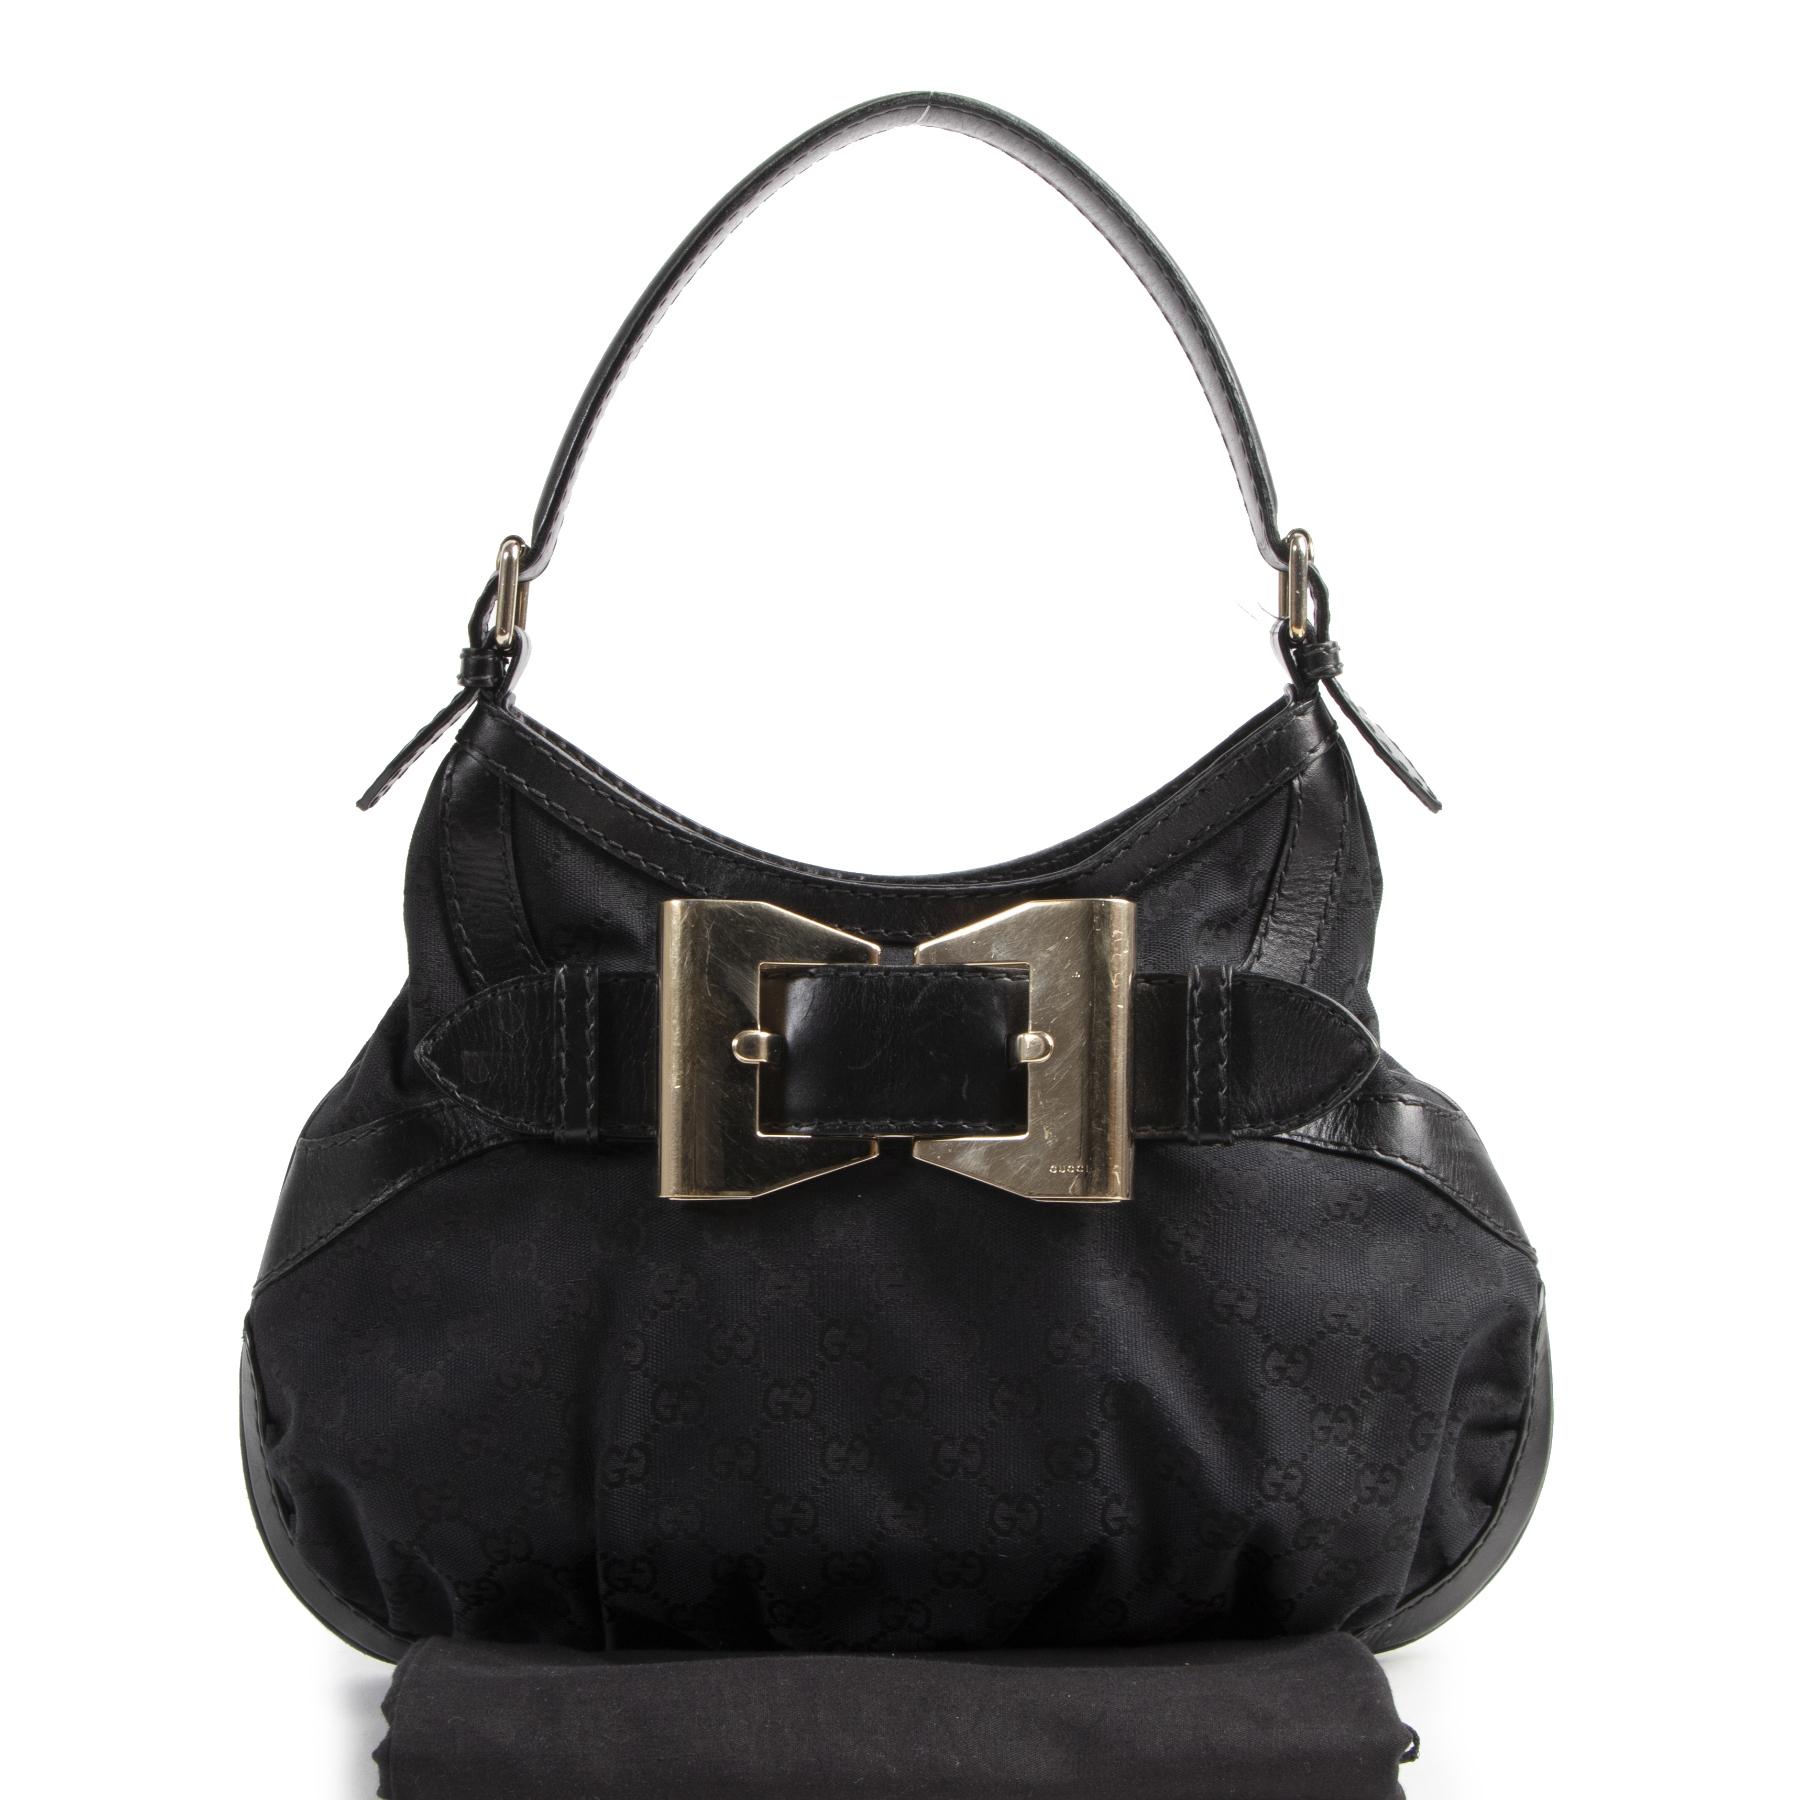 Authentic secondhand Gucci Black Queen Hobo Shoulder Bag designer bags fashion luxury vintage webshop safe secure online shopping